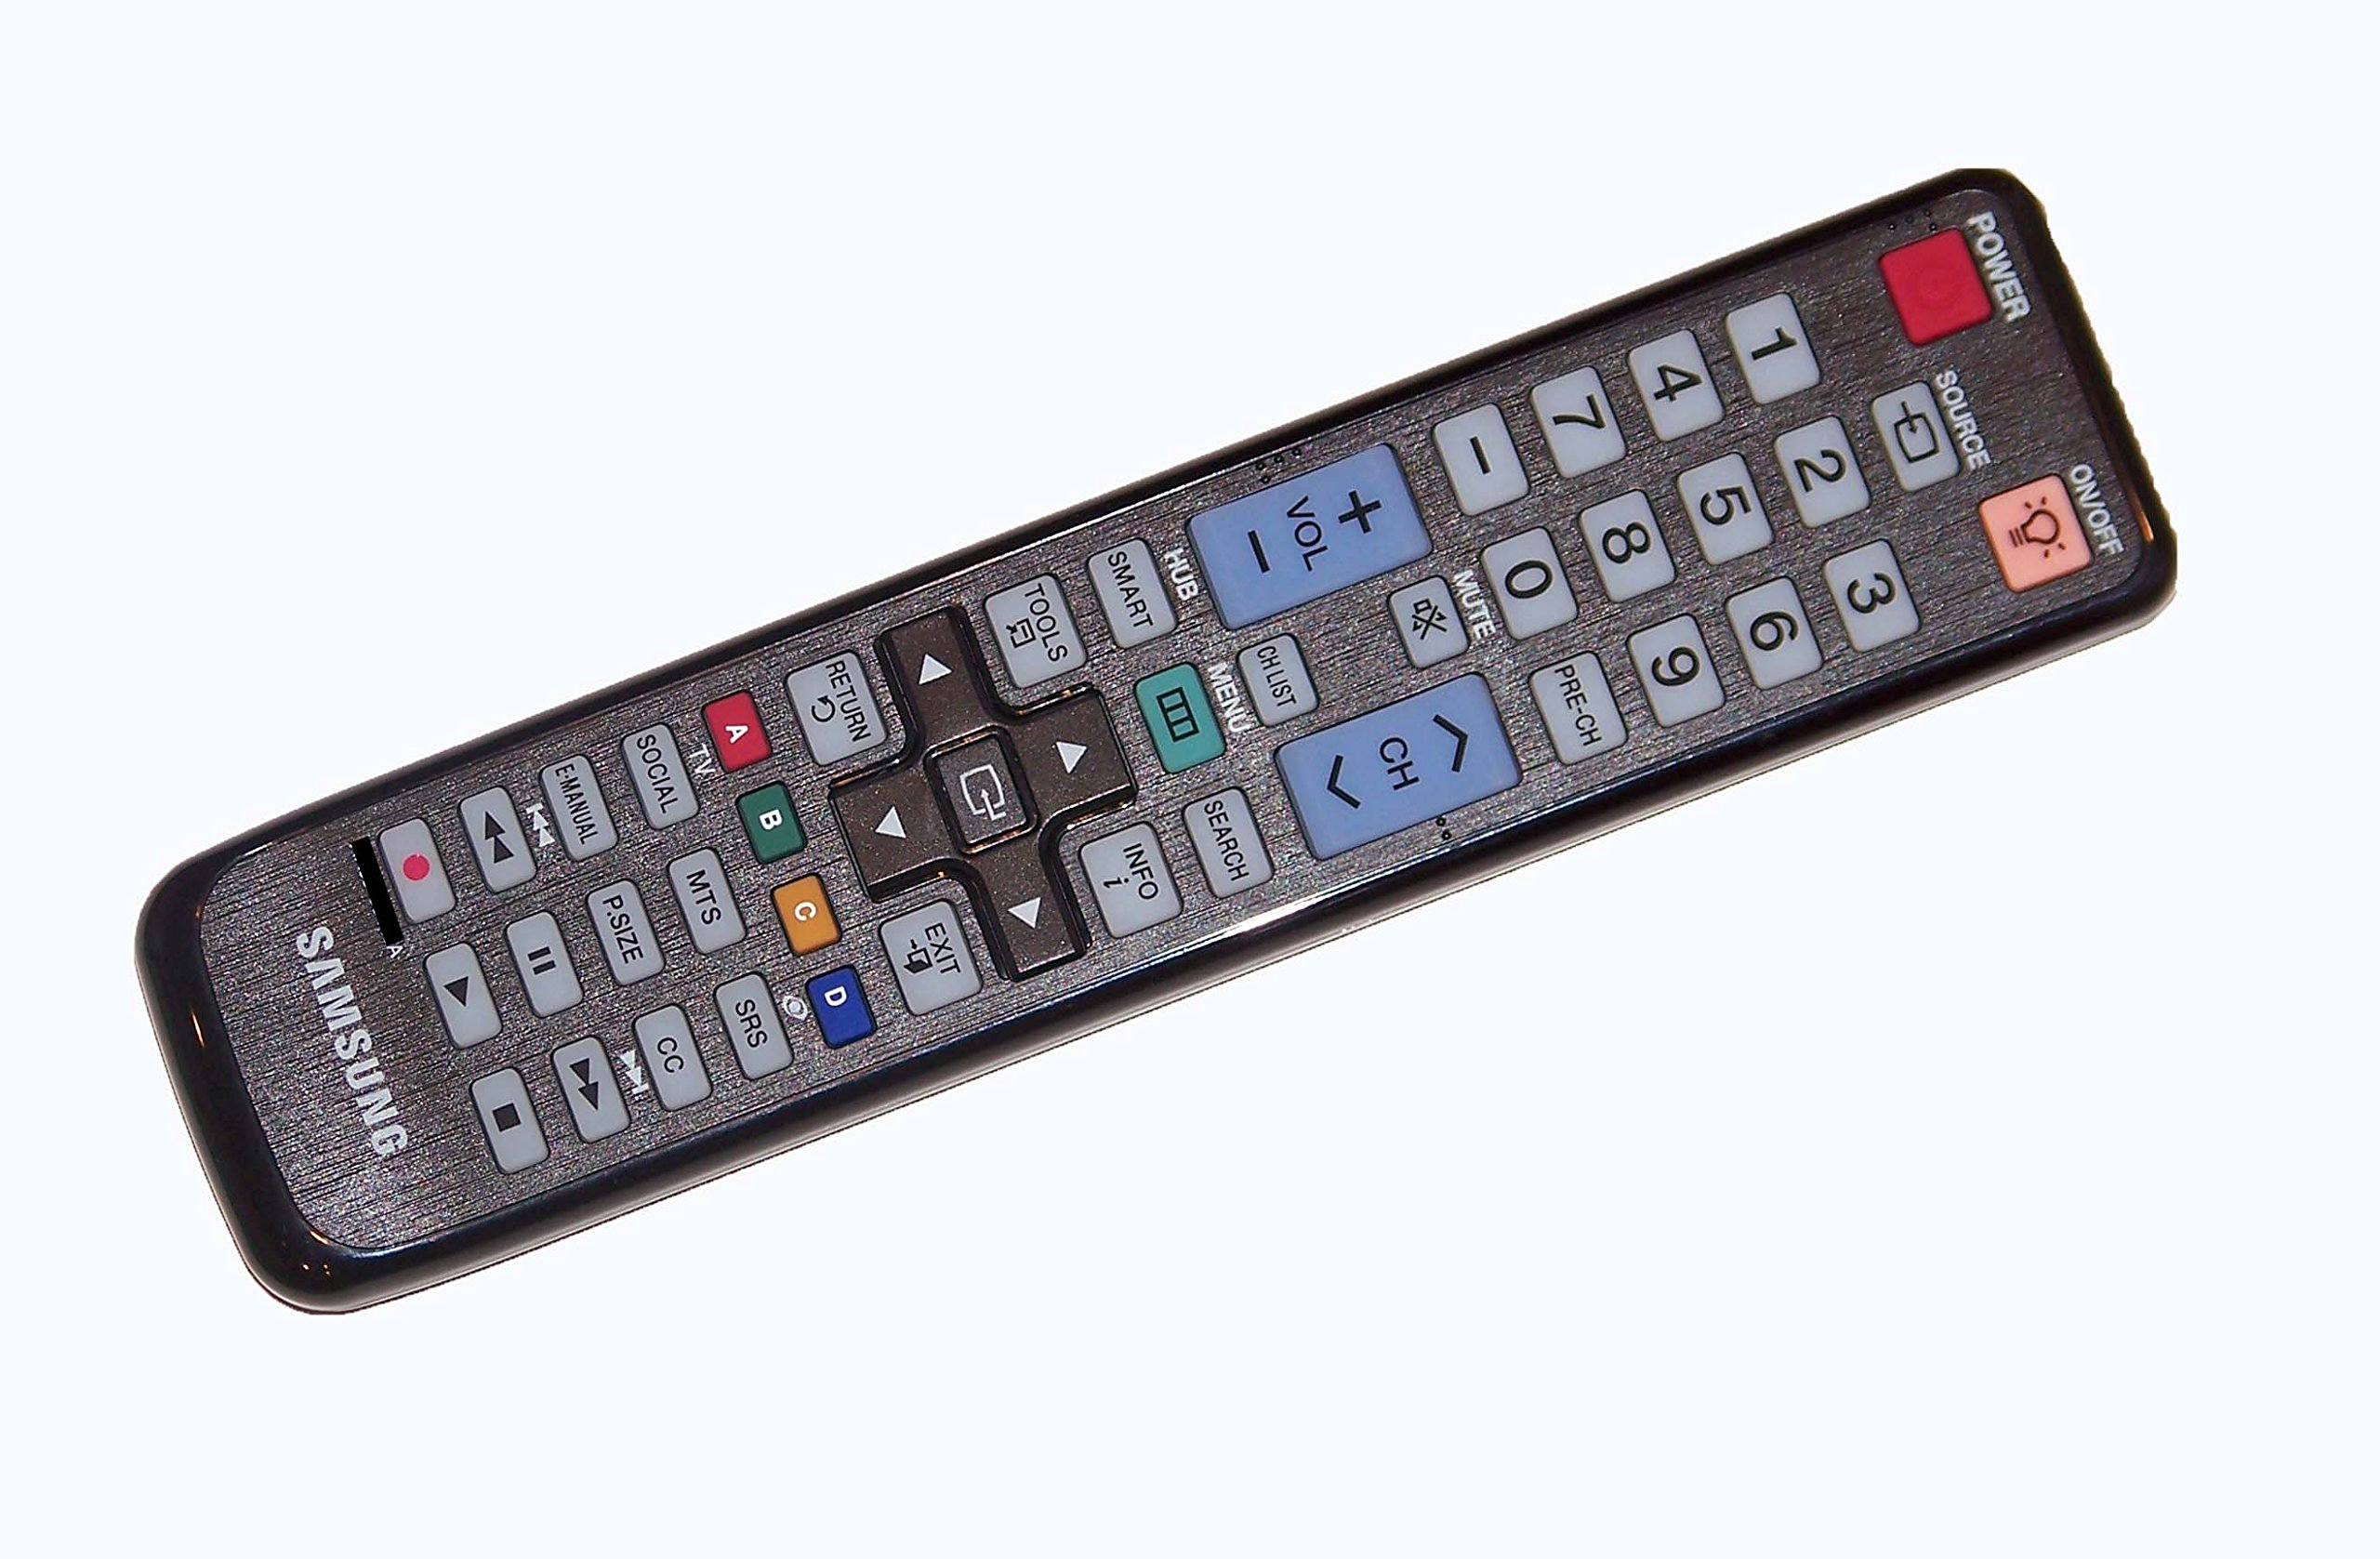 OEM Samsung Remote Control Originally Shipped With Samsung UN46D6900W, UN46D6900WF, UN46D6900WFXZA, UN46D6900WFXZC, UN46D7000L, UN46D7050X by Samsung